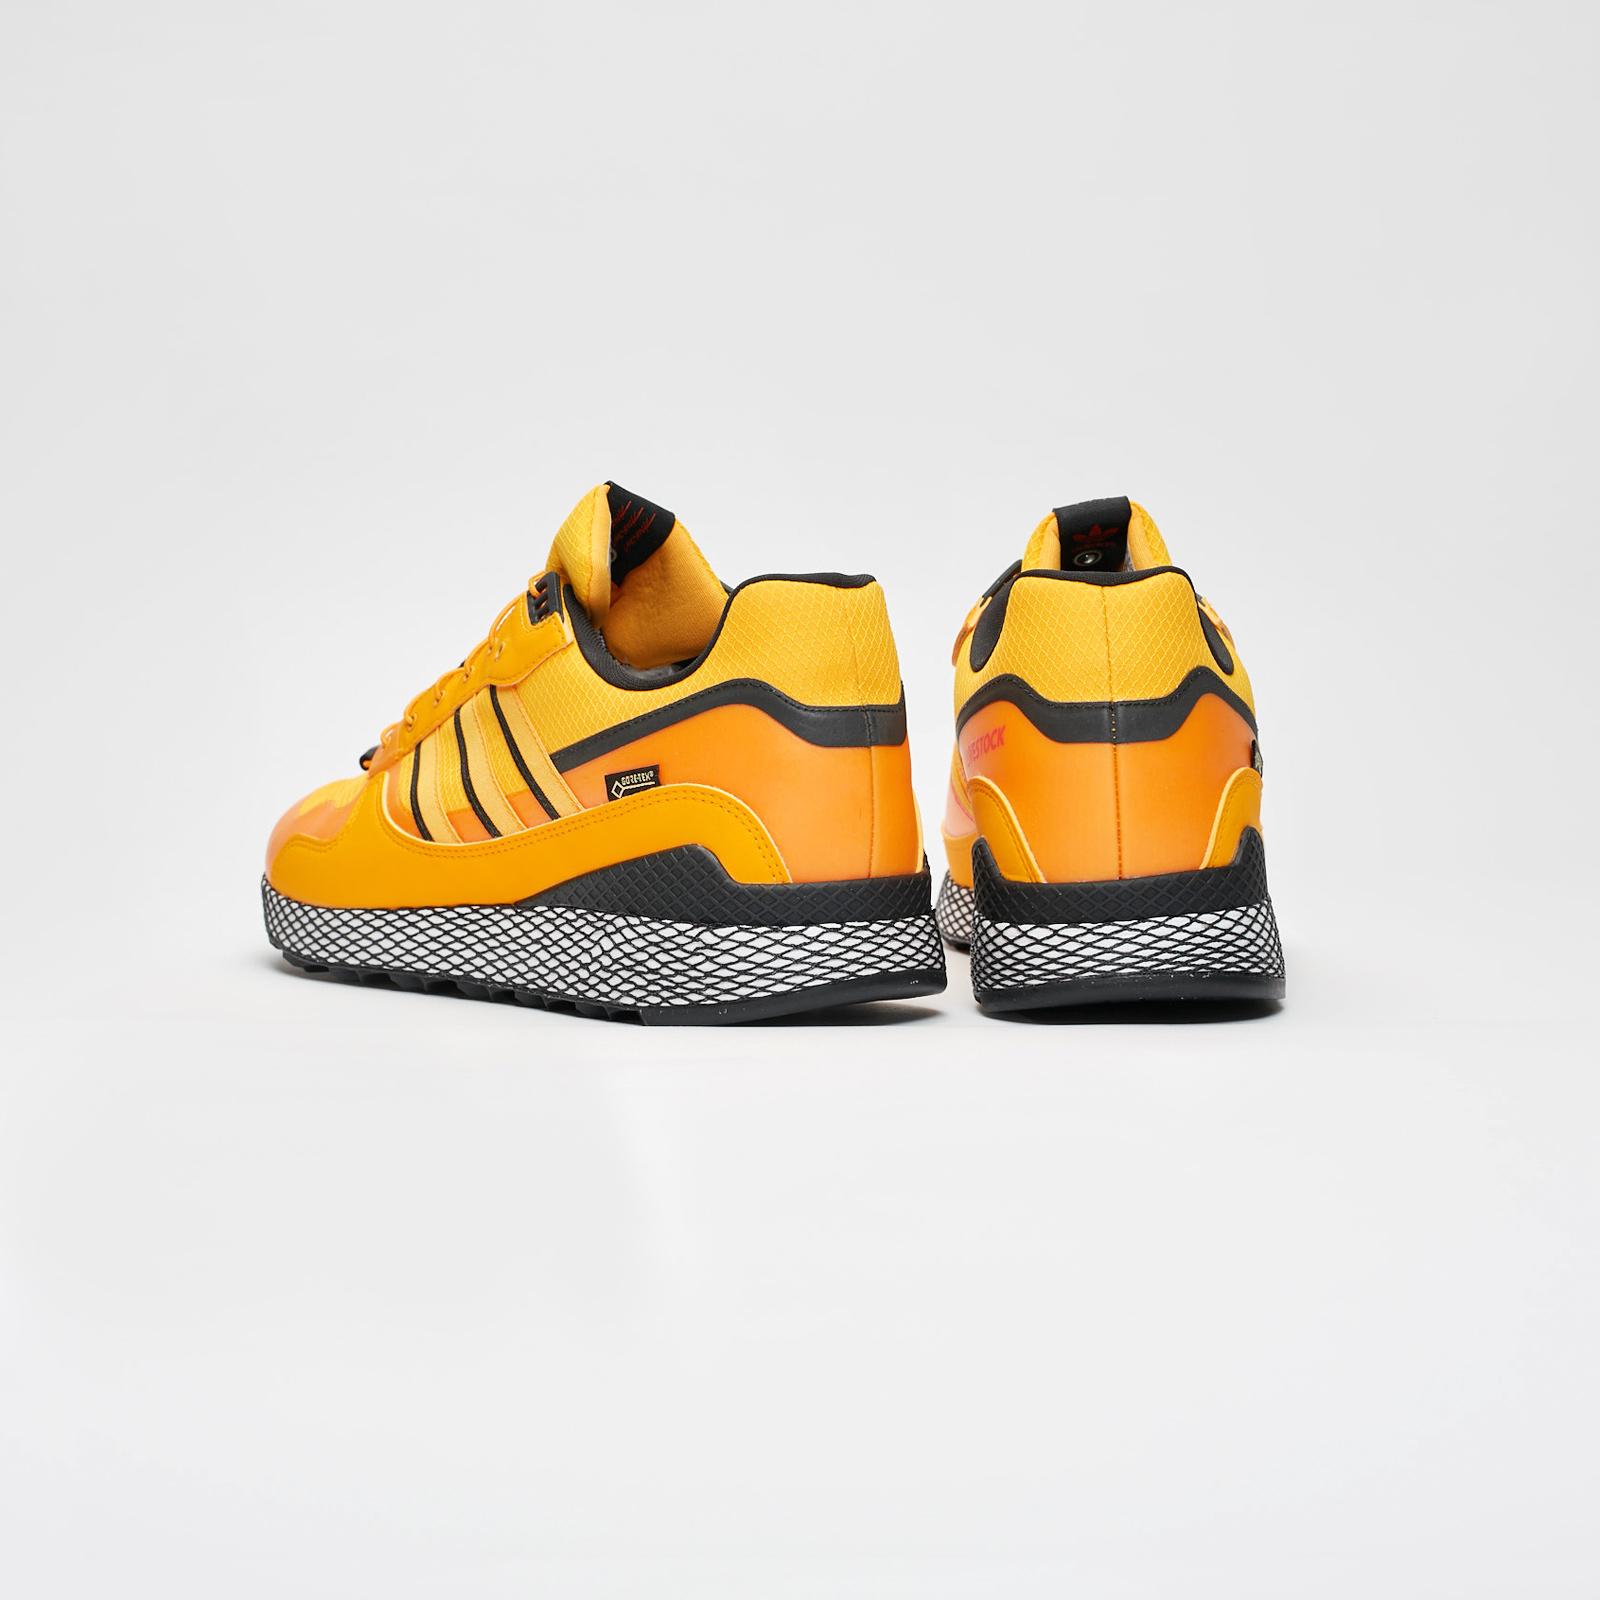 2bd069fdaa581 adidas Ultra Tech GORE-TEX LIVESTOCK - B37852 - Sneakersnstuff ...